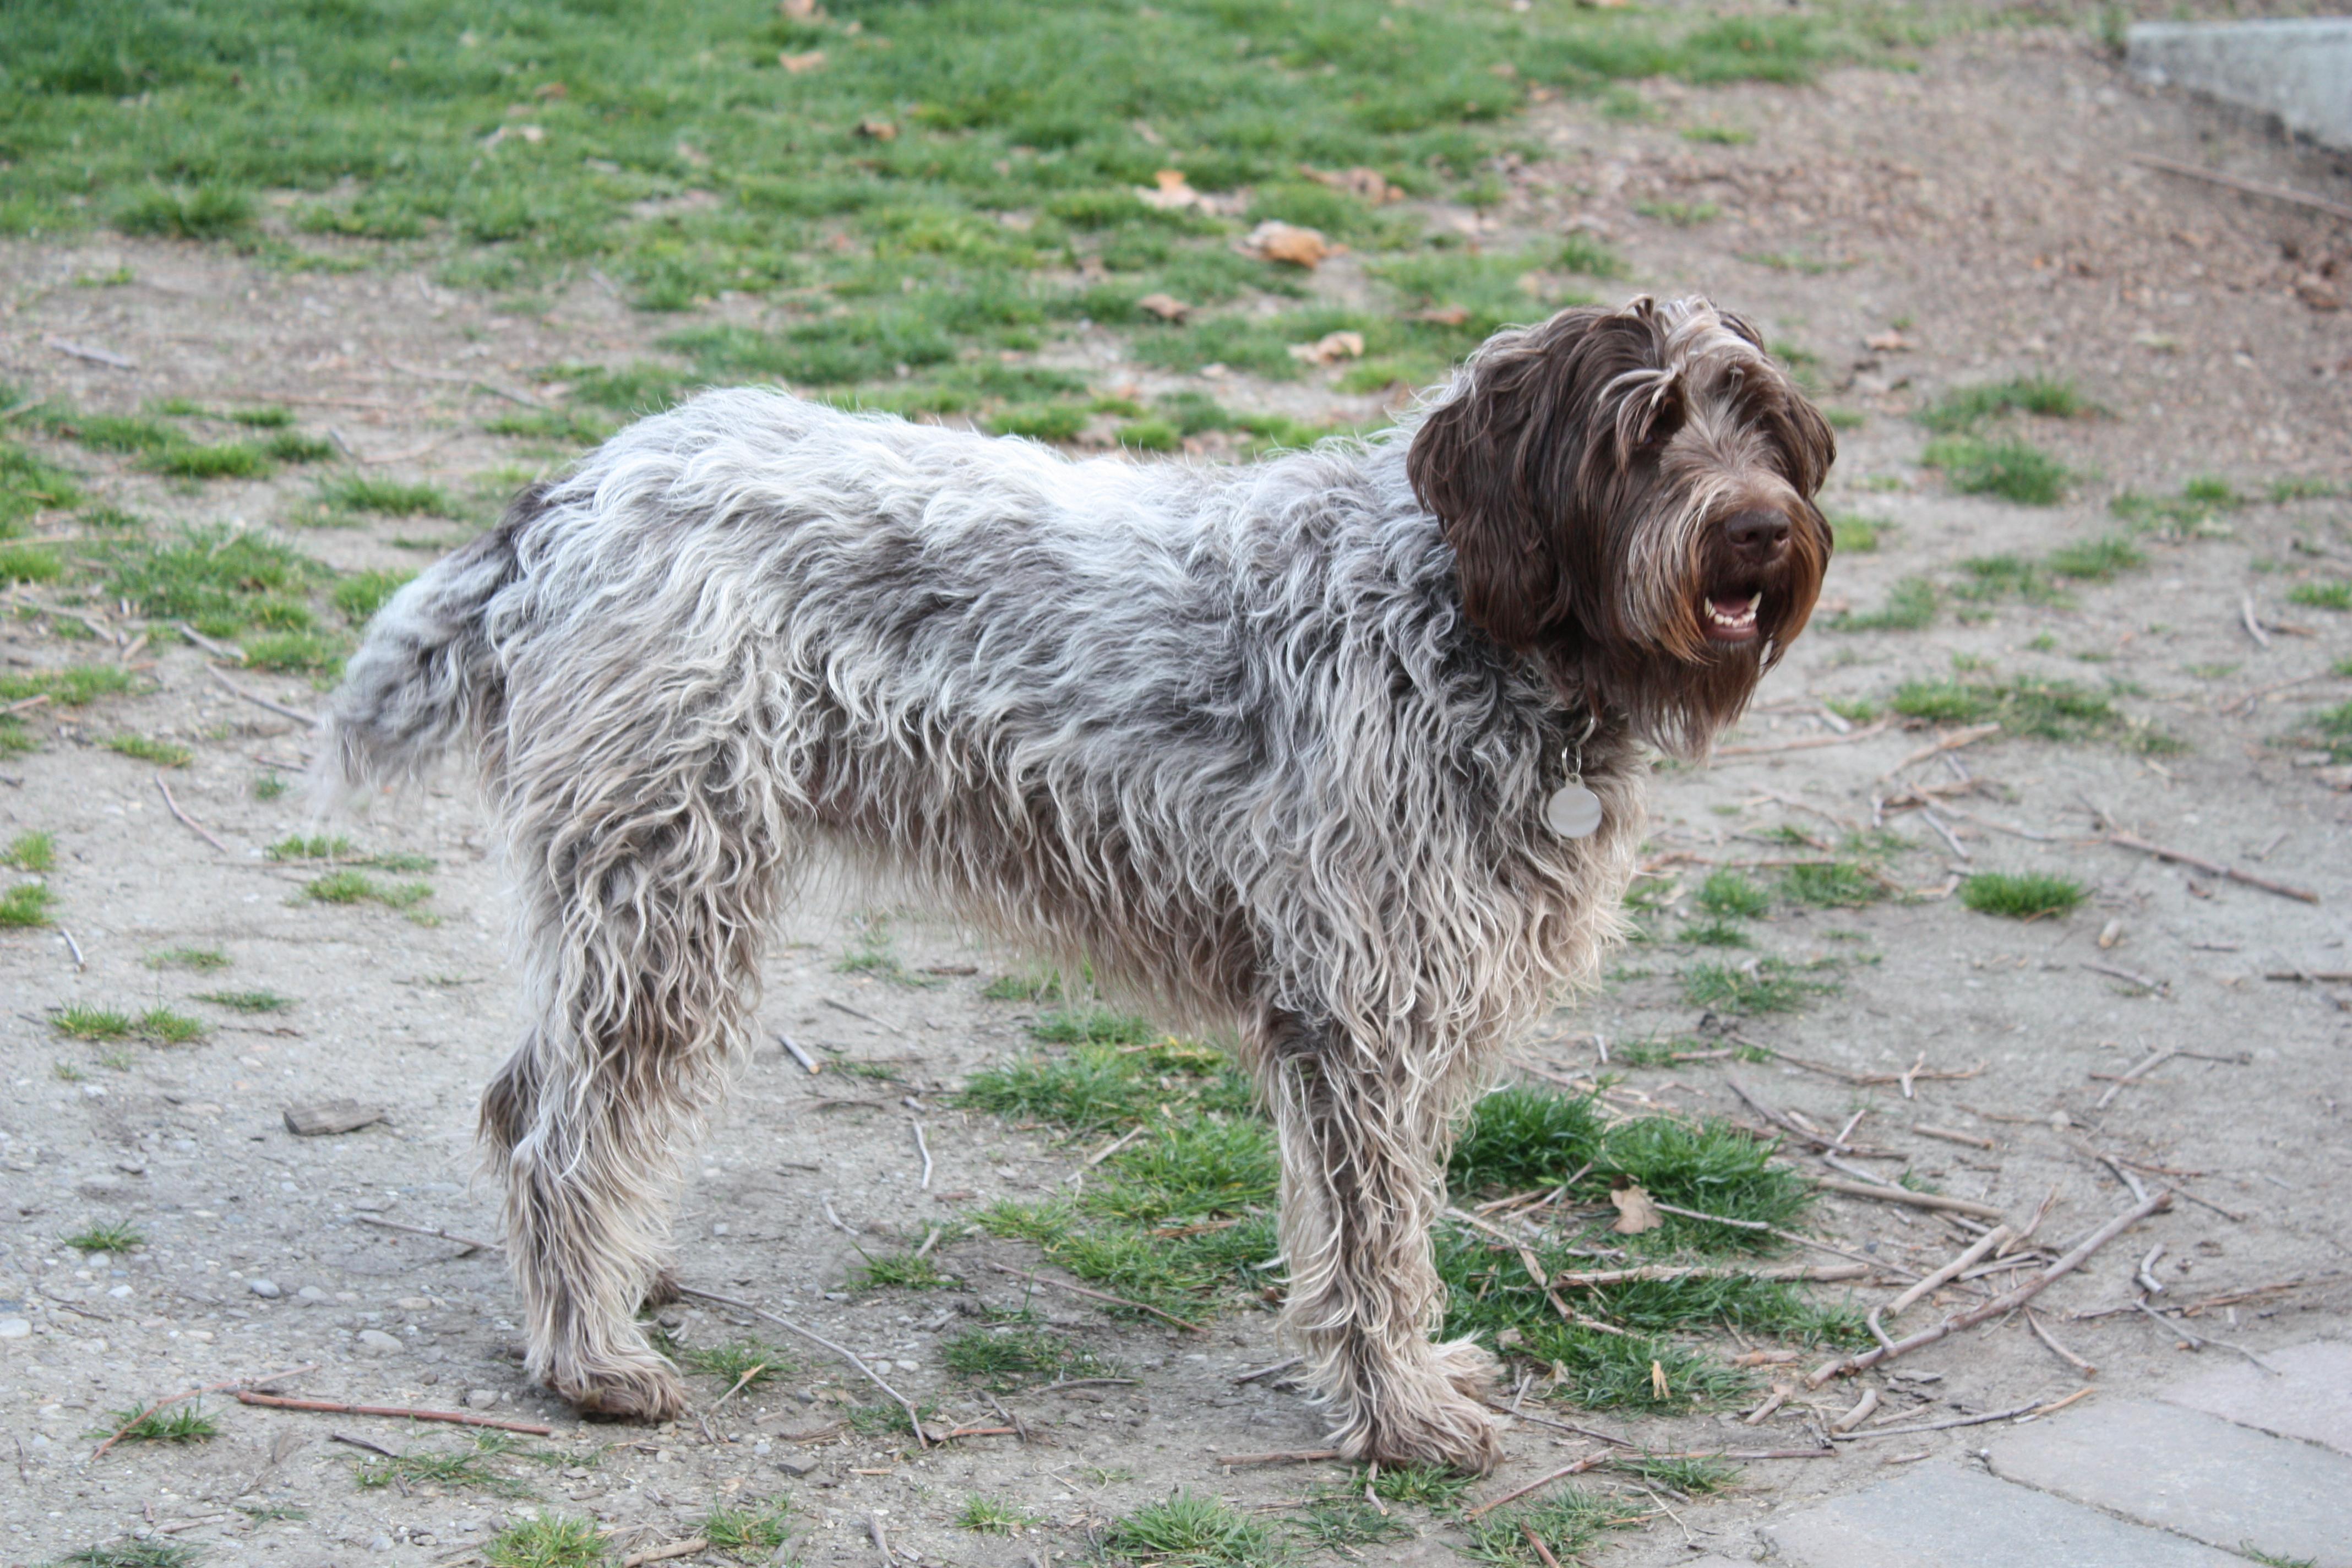 File:Griffon dog.jpg - Wikimedia Commons